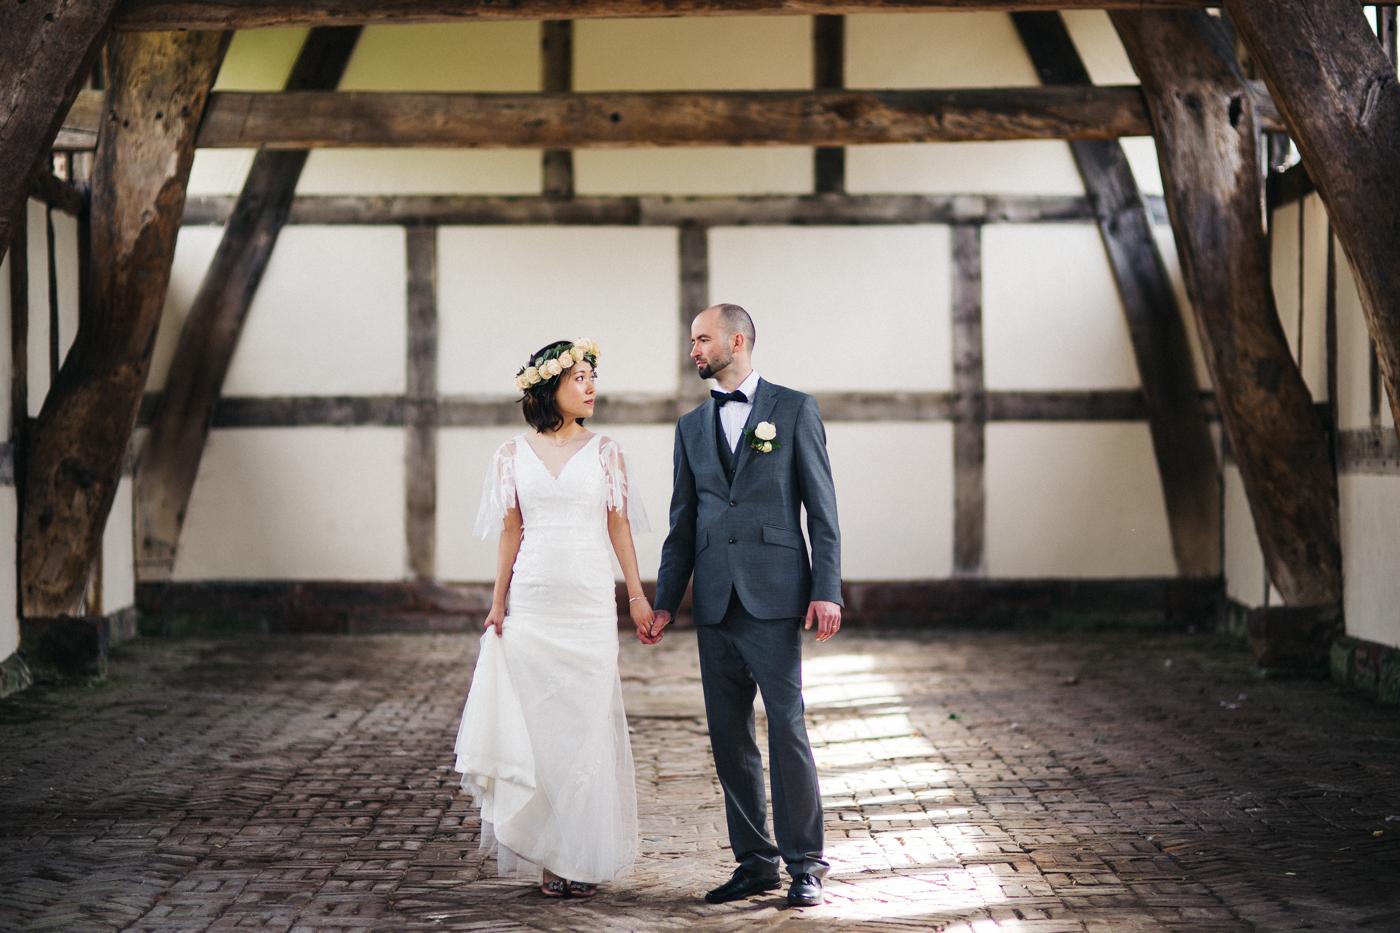 teesside-middlesbrough-north-east-wedding-photographer-creative-wedding-venues-0055.jpg